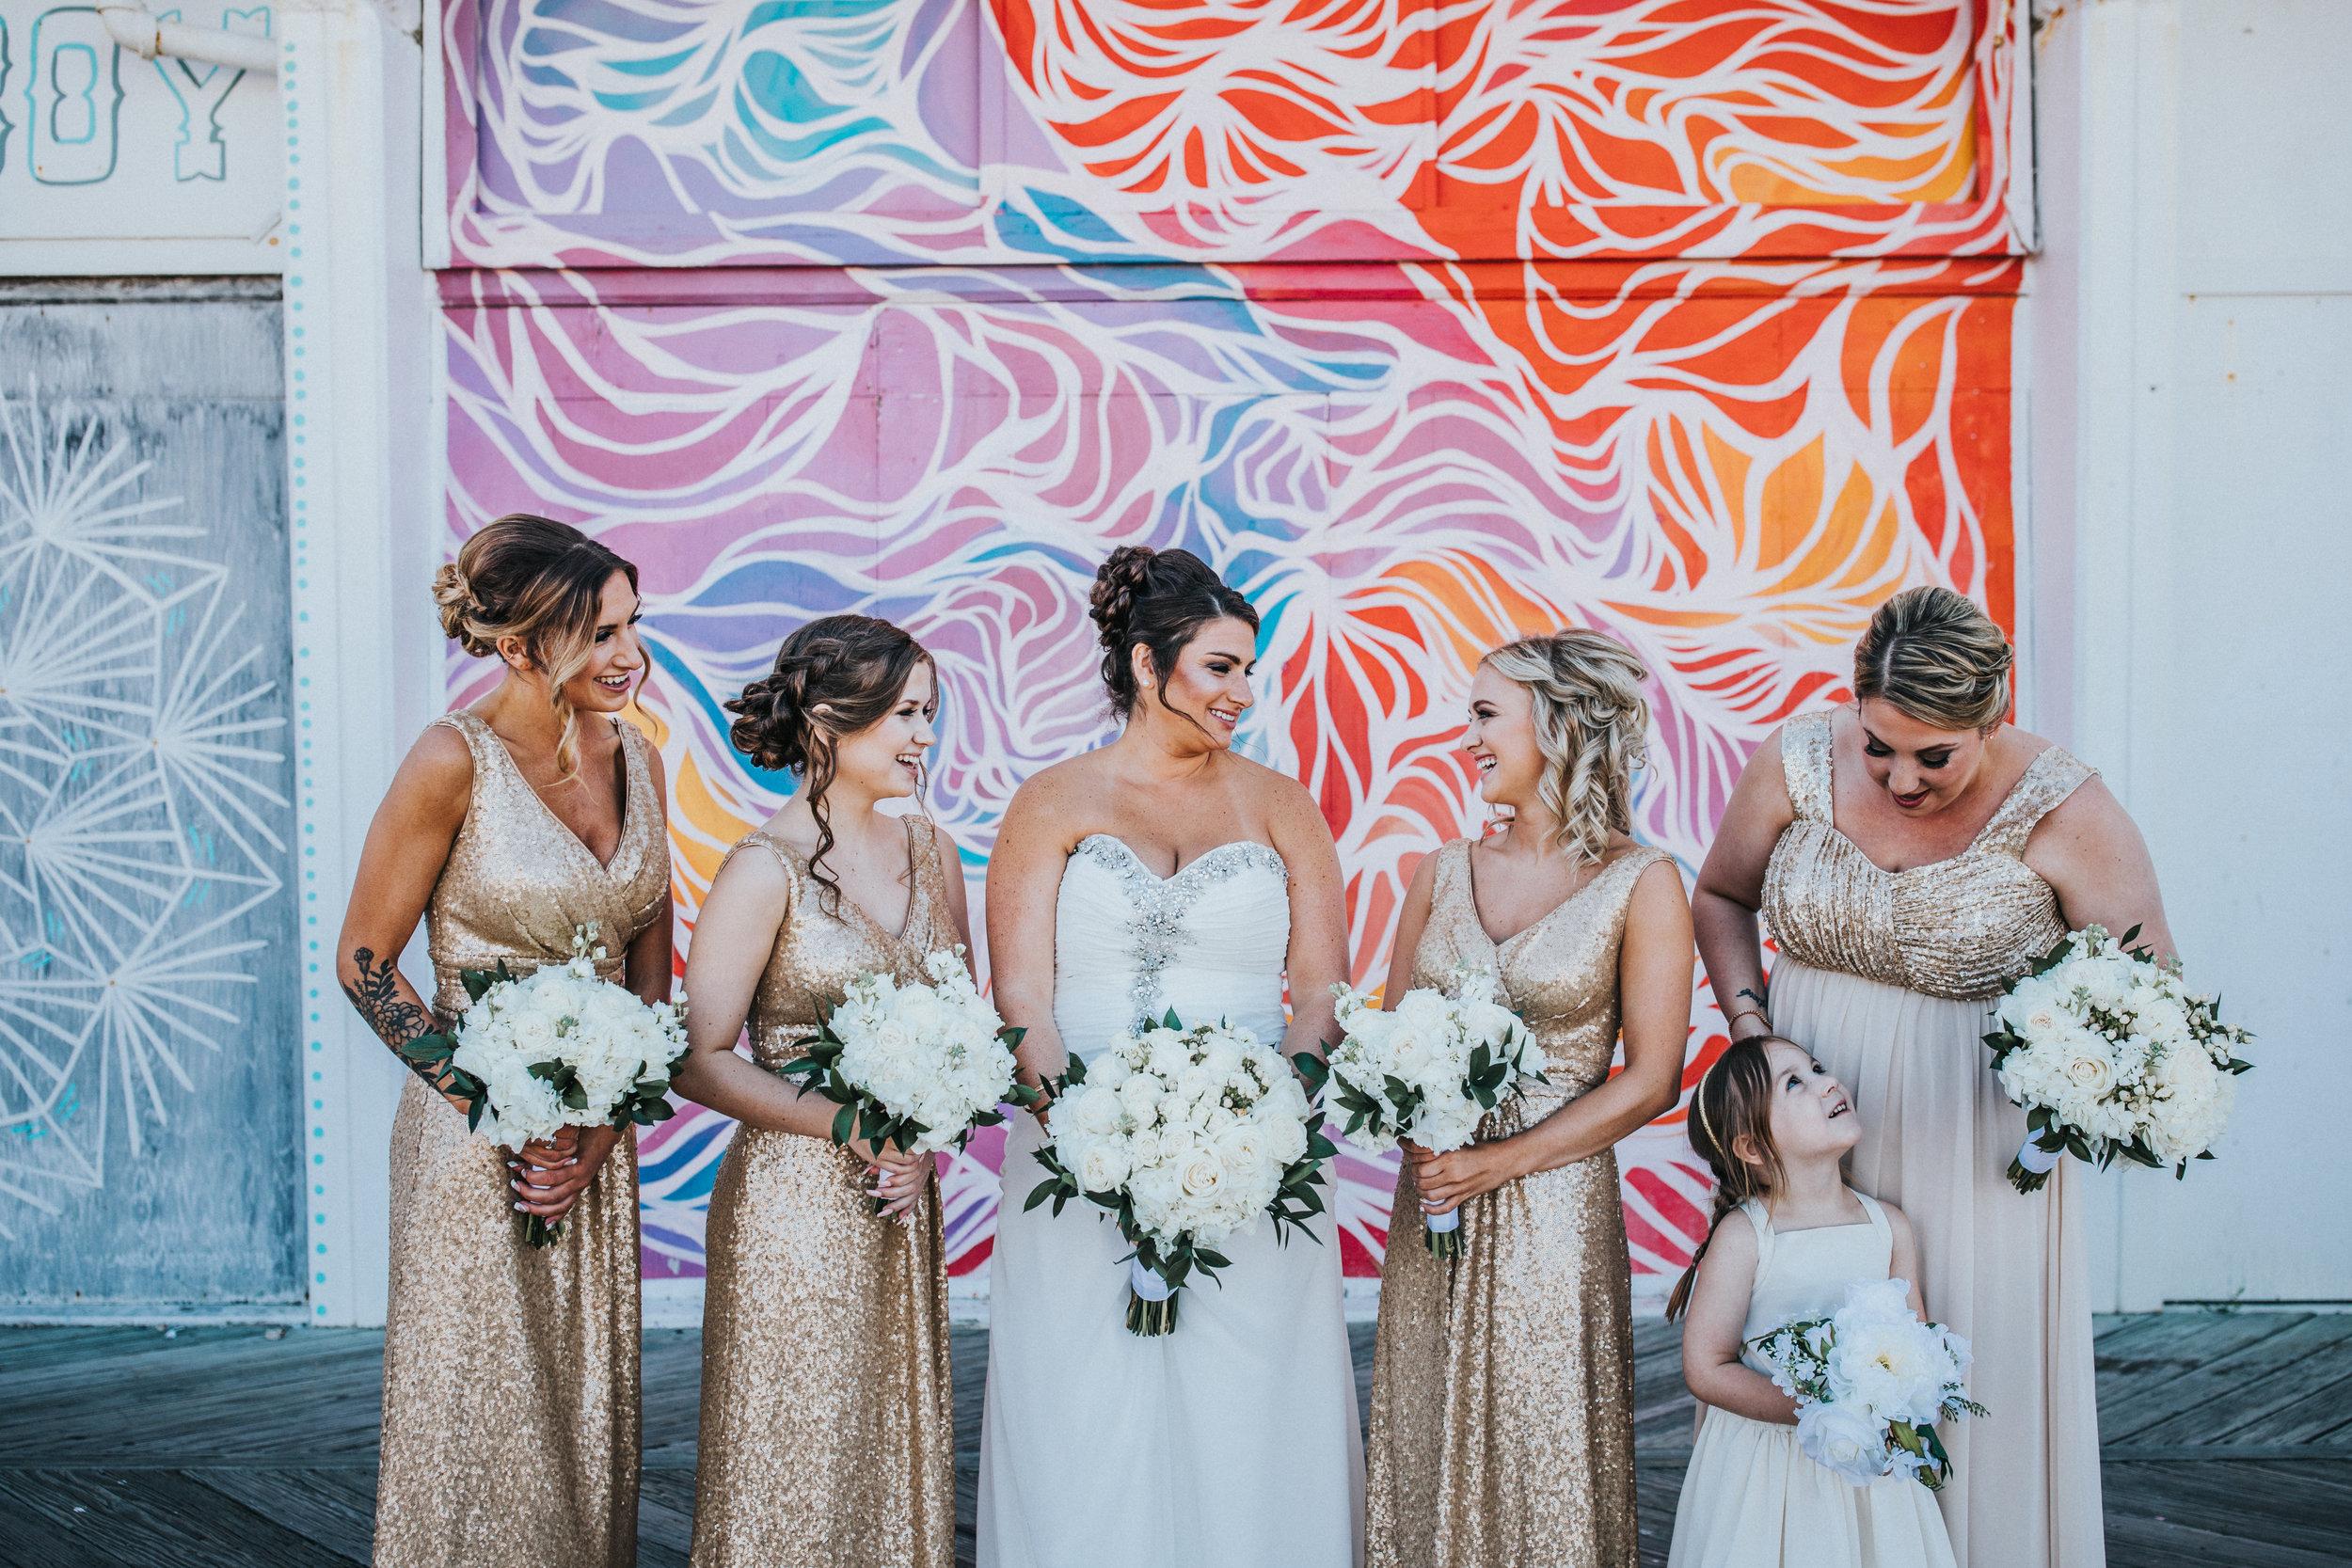 JennaLynnPhotography-NJWeddingPhotographer-Wedding-TheBerkeley-AsburyPark-Allison&Michael-BridalParty-26.jpg